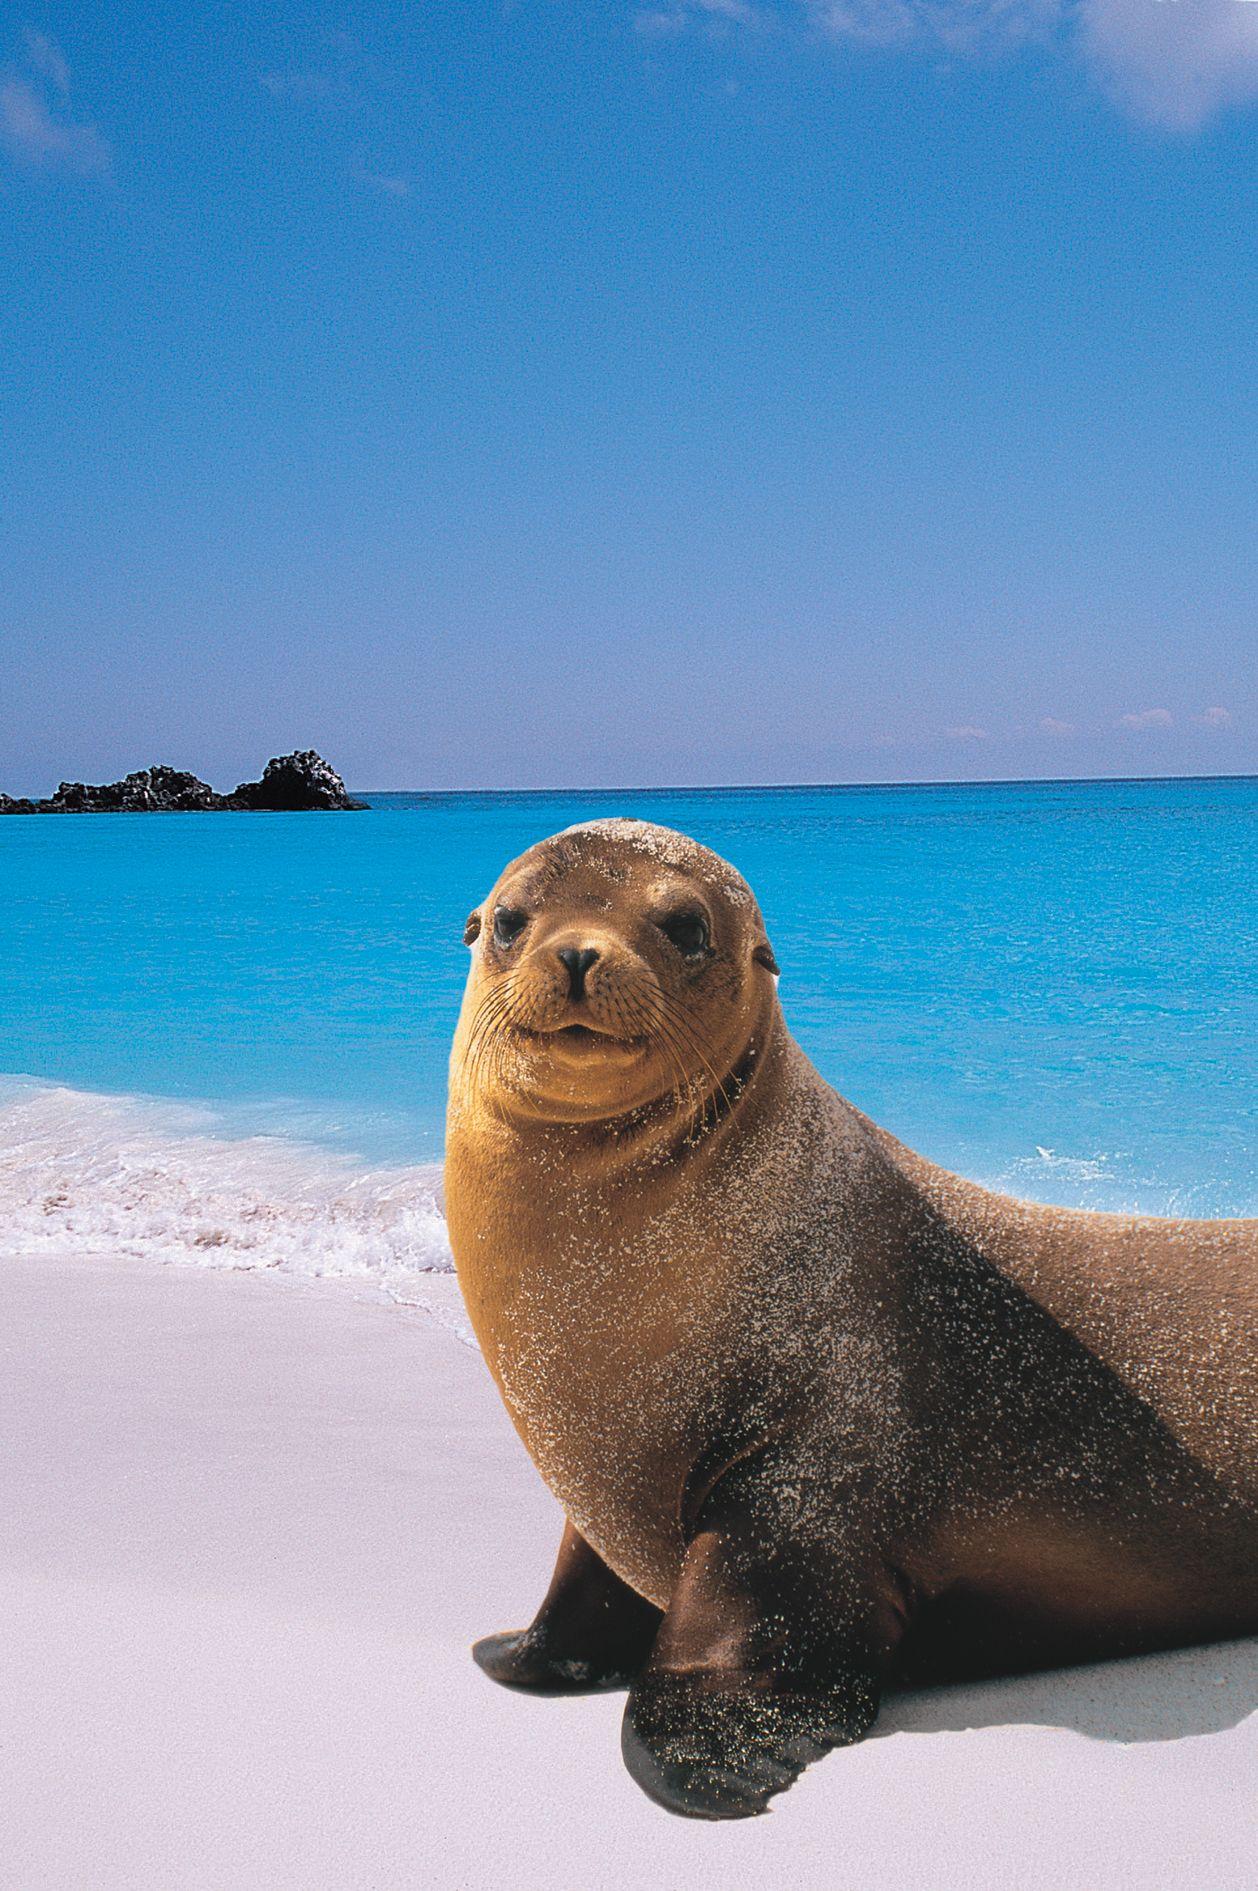 Ecuador Amp The Galapagos Islands Adventure Tours In 2019